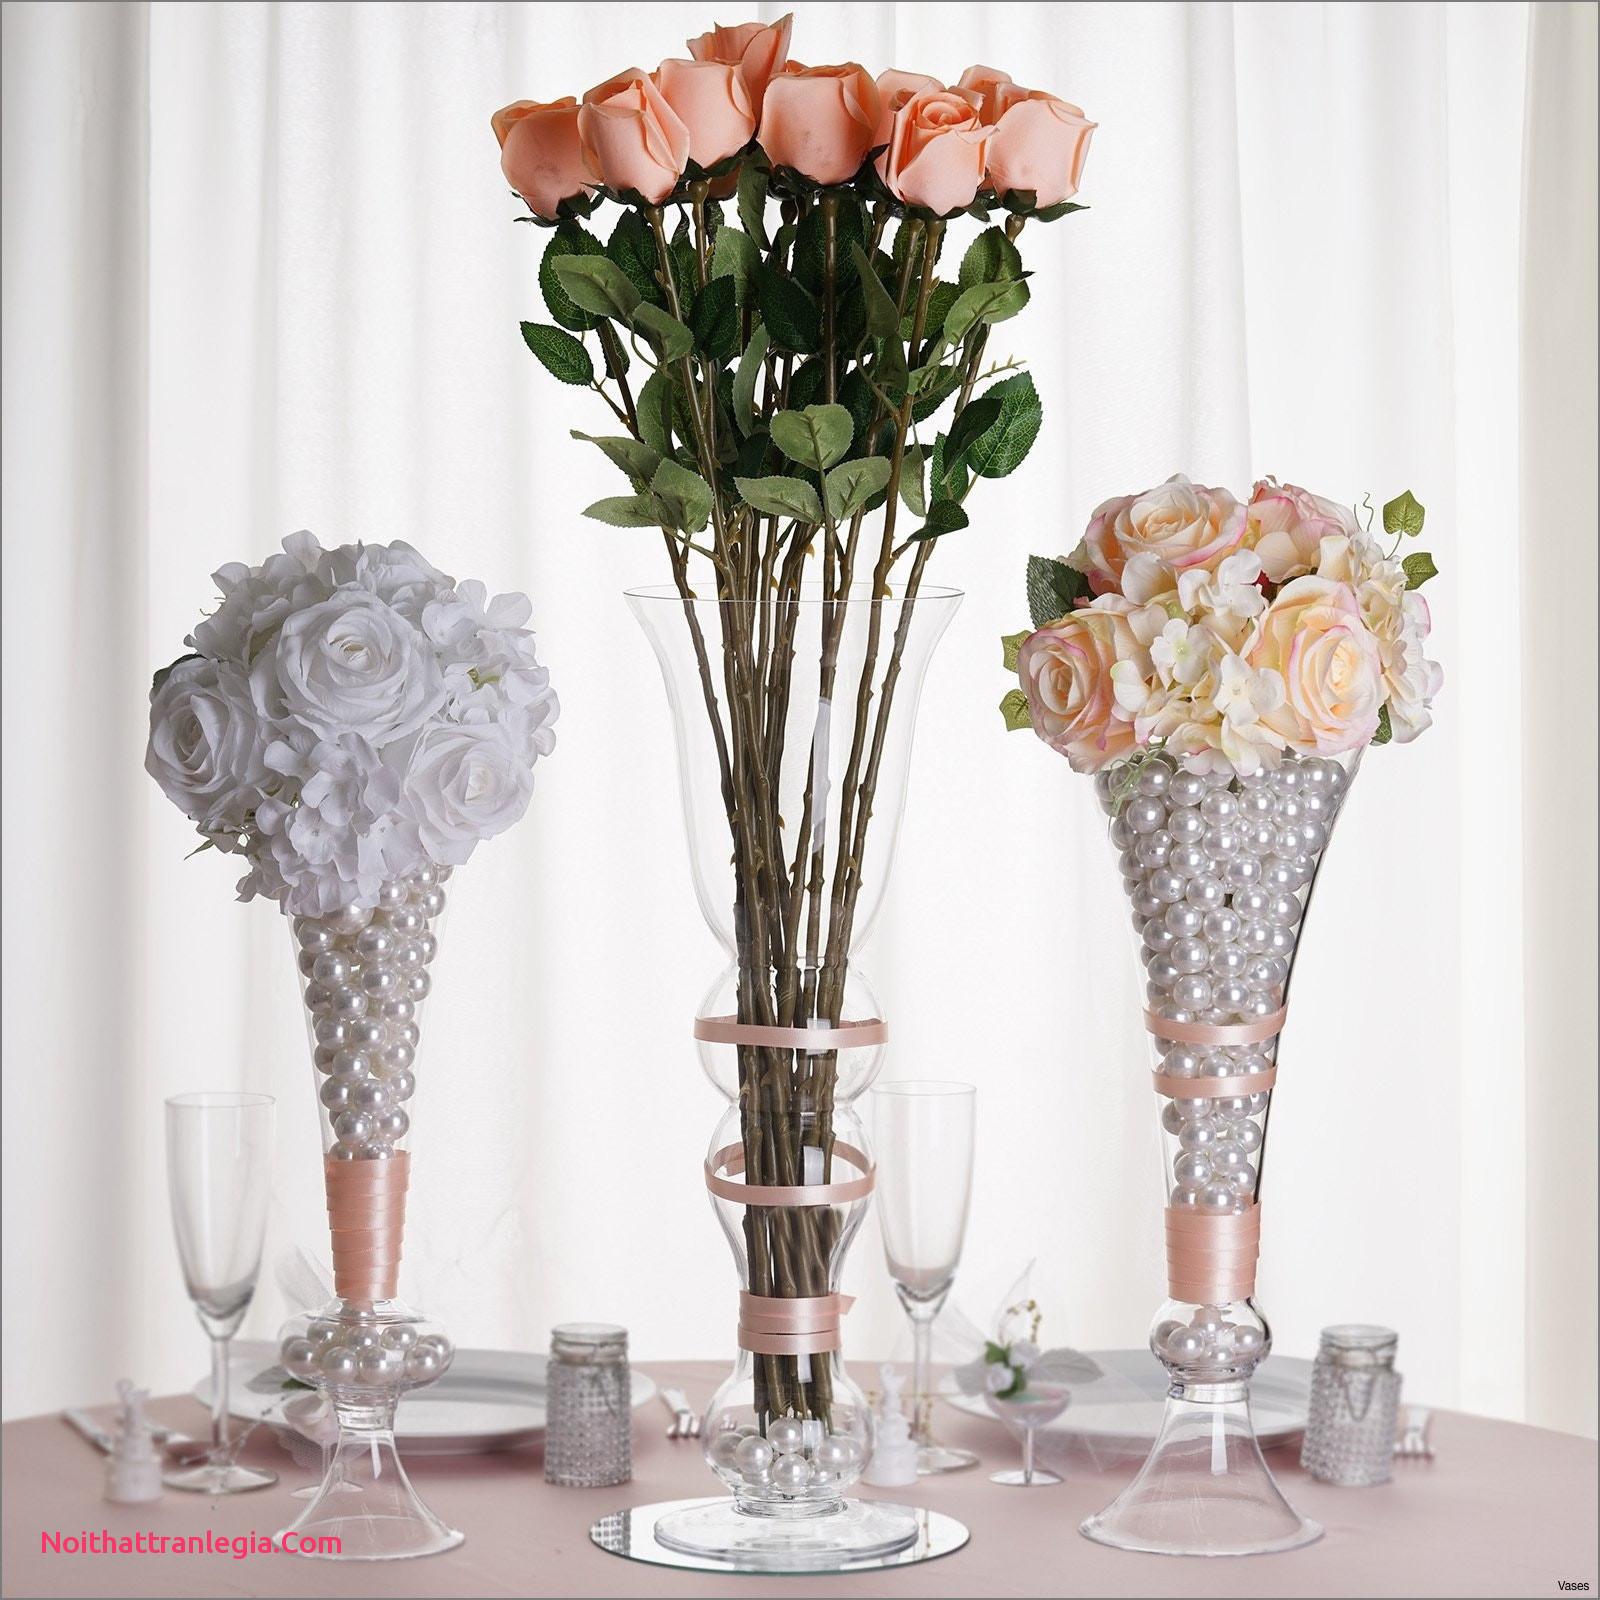 flower bud vases wholesale of 20 how to clean flower vases noithattranlegia vases design intended for update clipart awesome flower vase table 04h vases tablei 0d clipart dining base end design